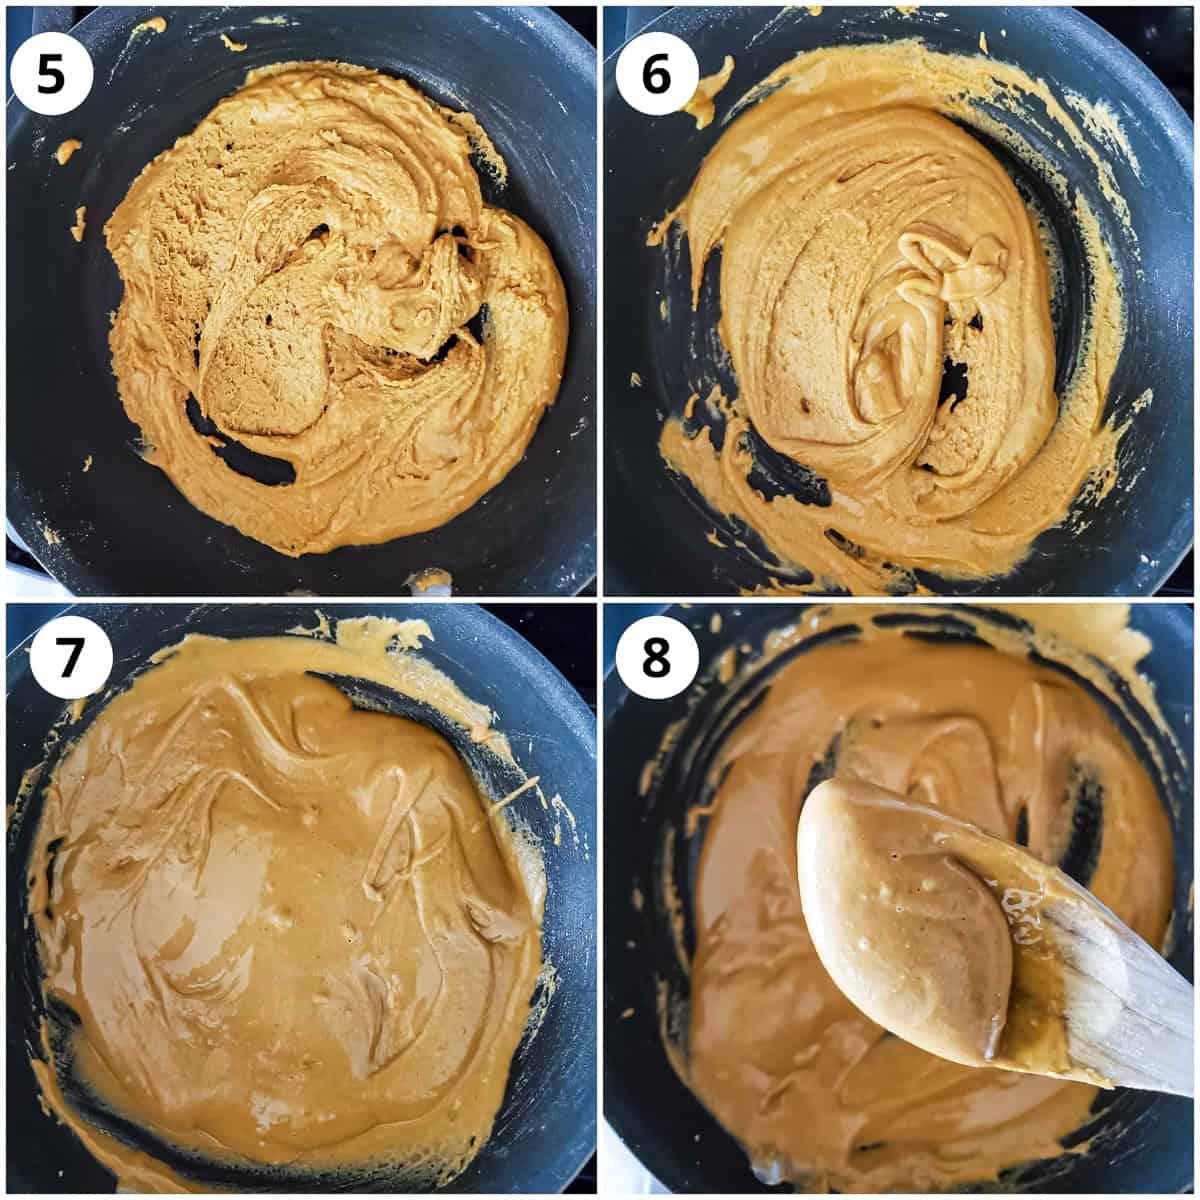 Steps for cooking besan (gram flour until light and fluffy)